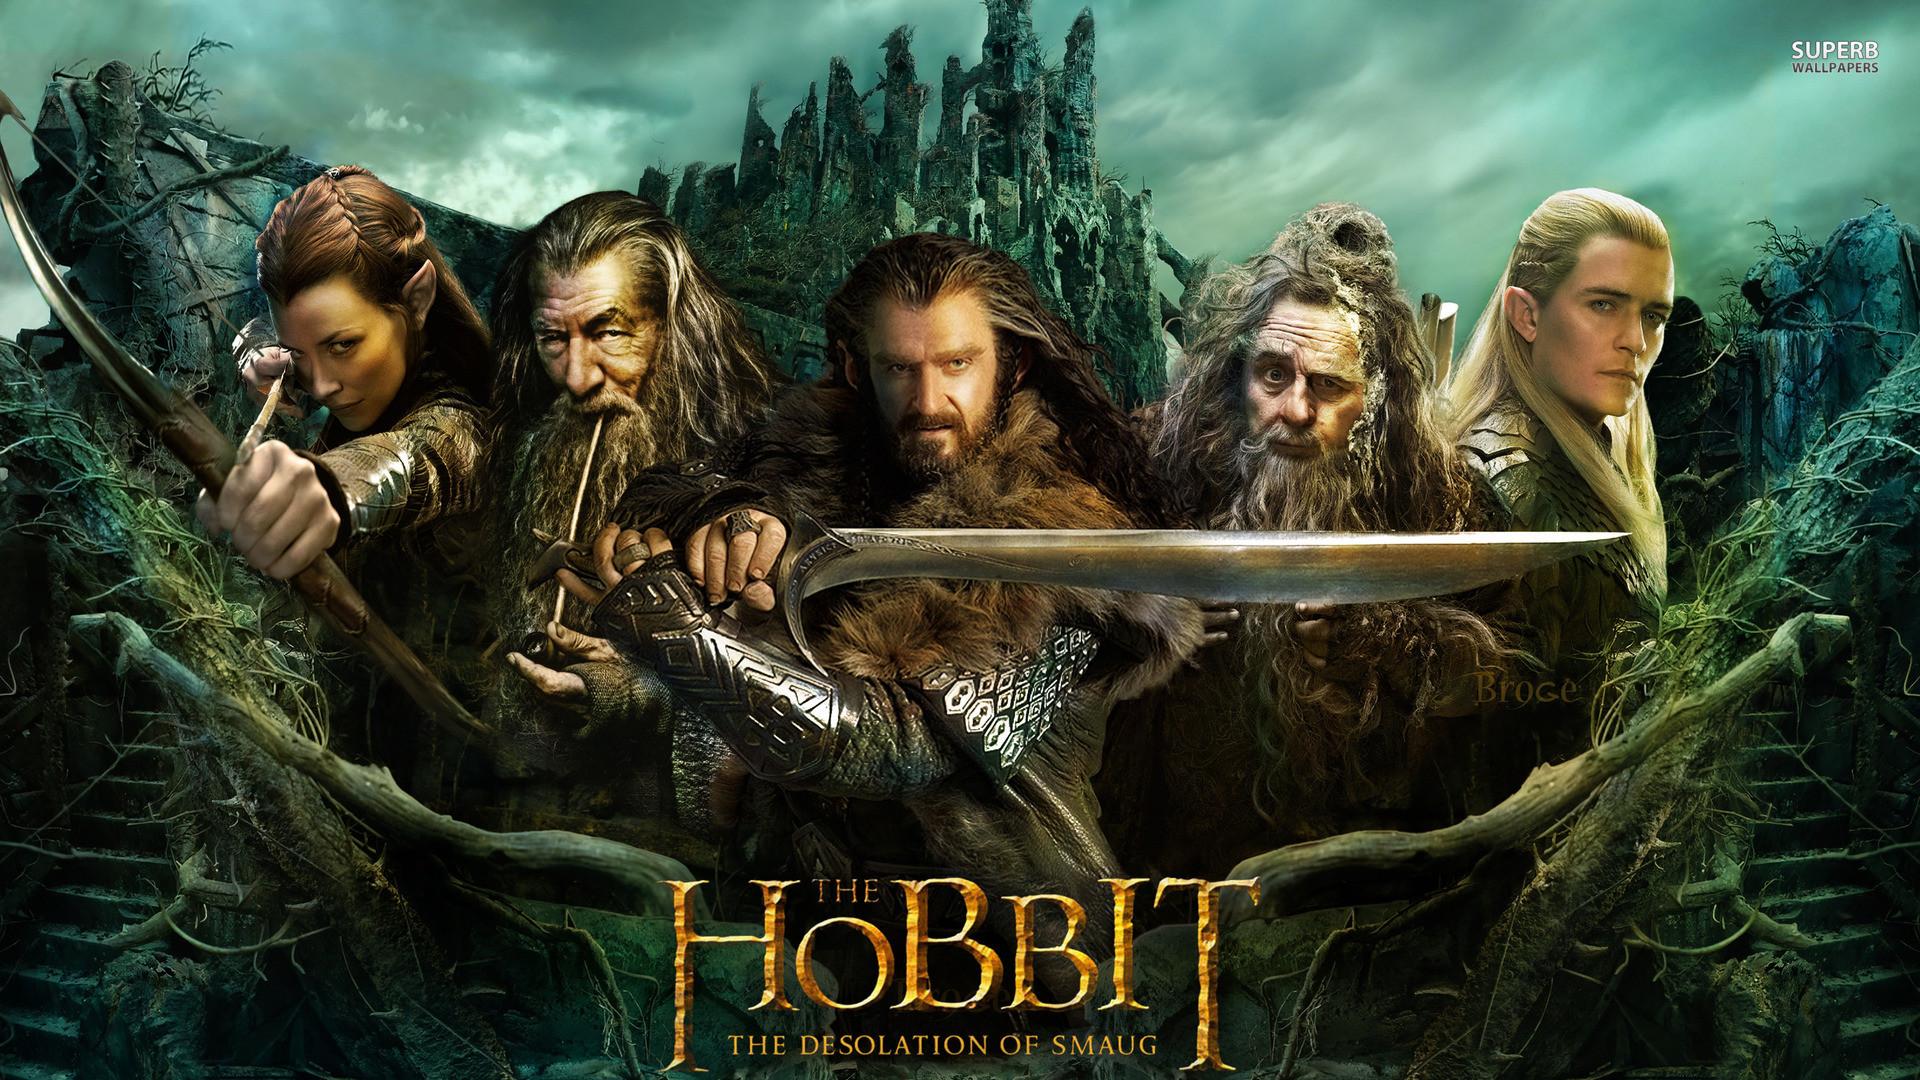 The Hobbit: The Desolation of Smaug wallpaper 1920×1080